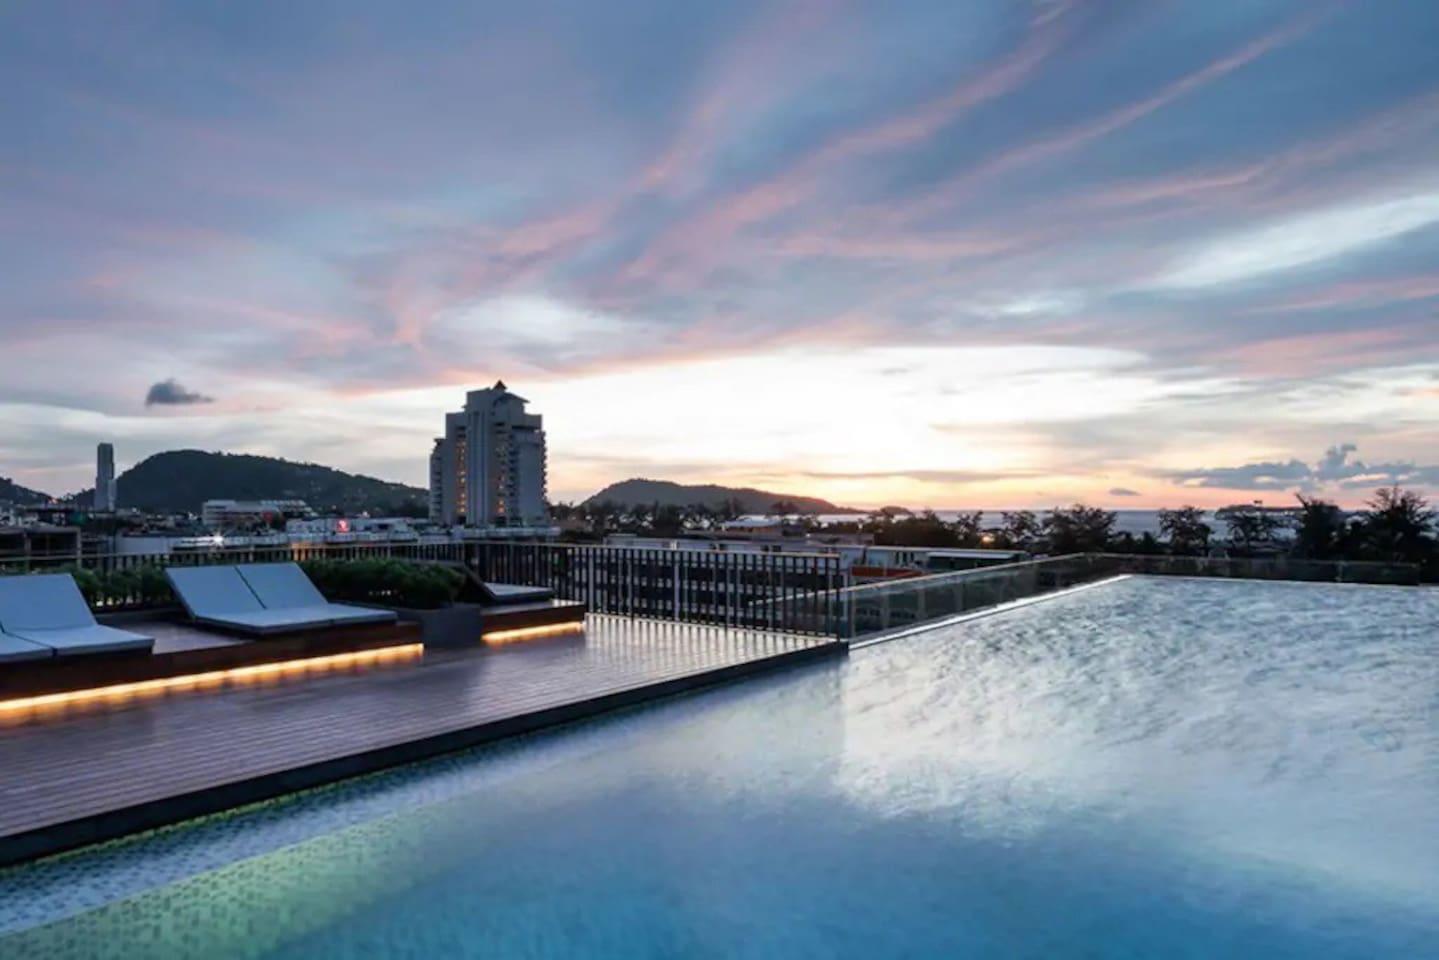 One bedroom & roof top pool at Patong Beach #D69 อพาร์ตเมนต์ 1 ห้องนอน 1 ห้องน้ำส่วนตัว ขนาด 30 ตร.ม. – ป่าตอง